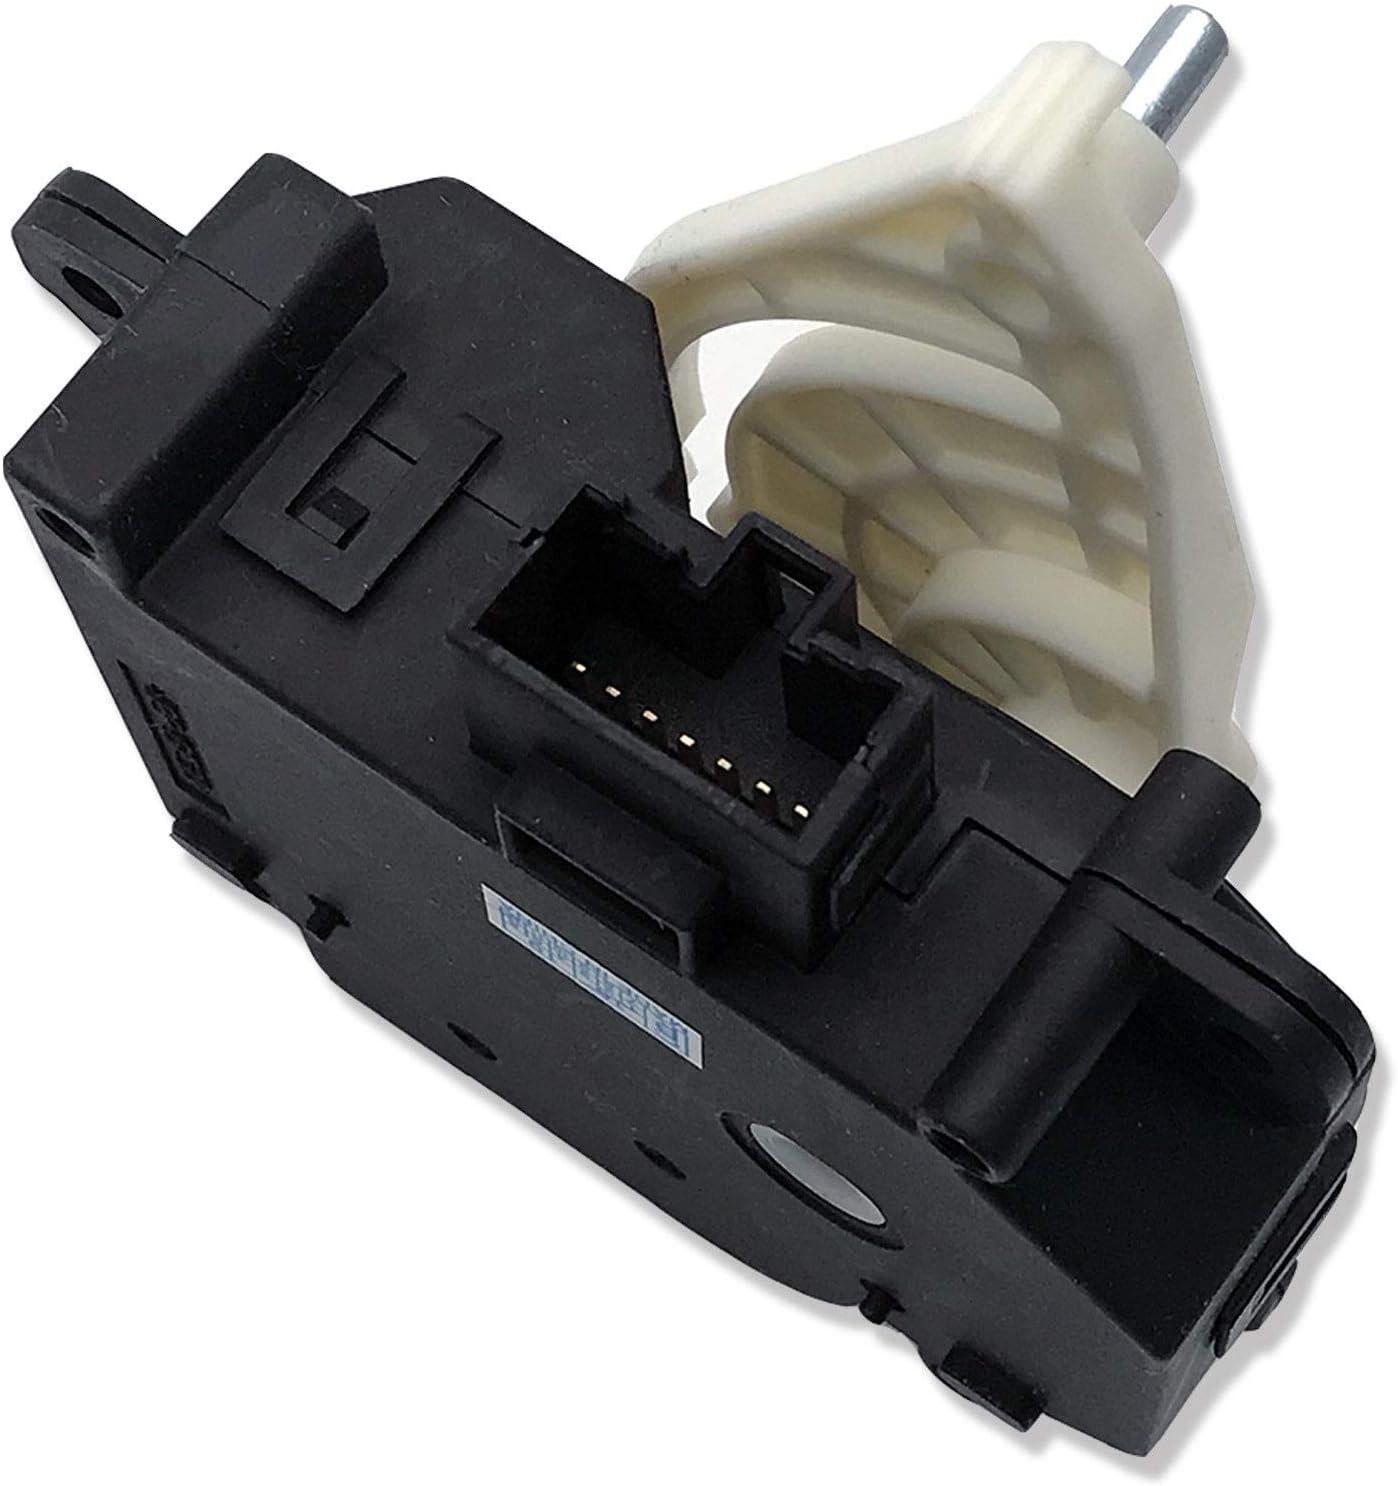 RX300 1999-2003 3.0L 87106-30371 CBK Climate Control Damper Servo for Lexus GS300 1998-2005